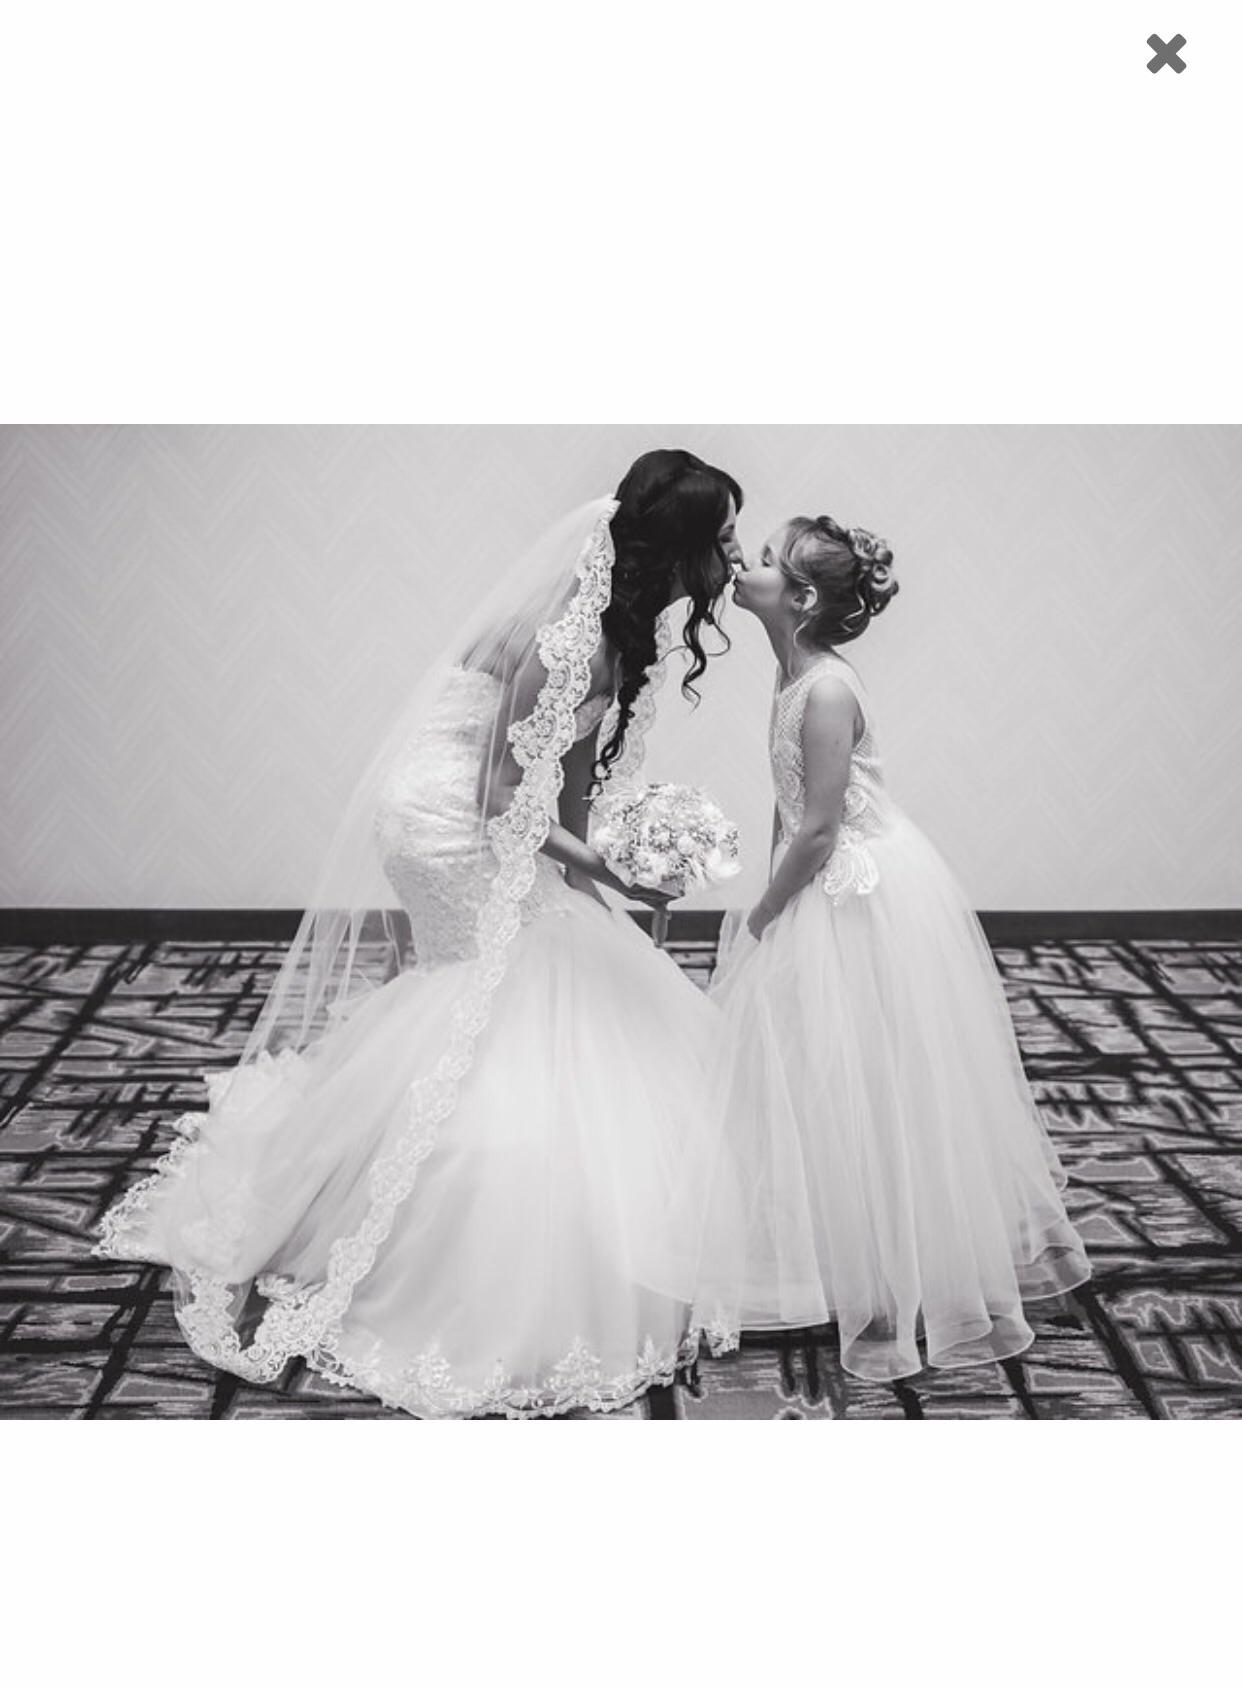 BlancaVeils.com Lace Wedding Veil